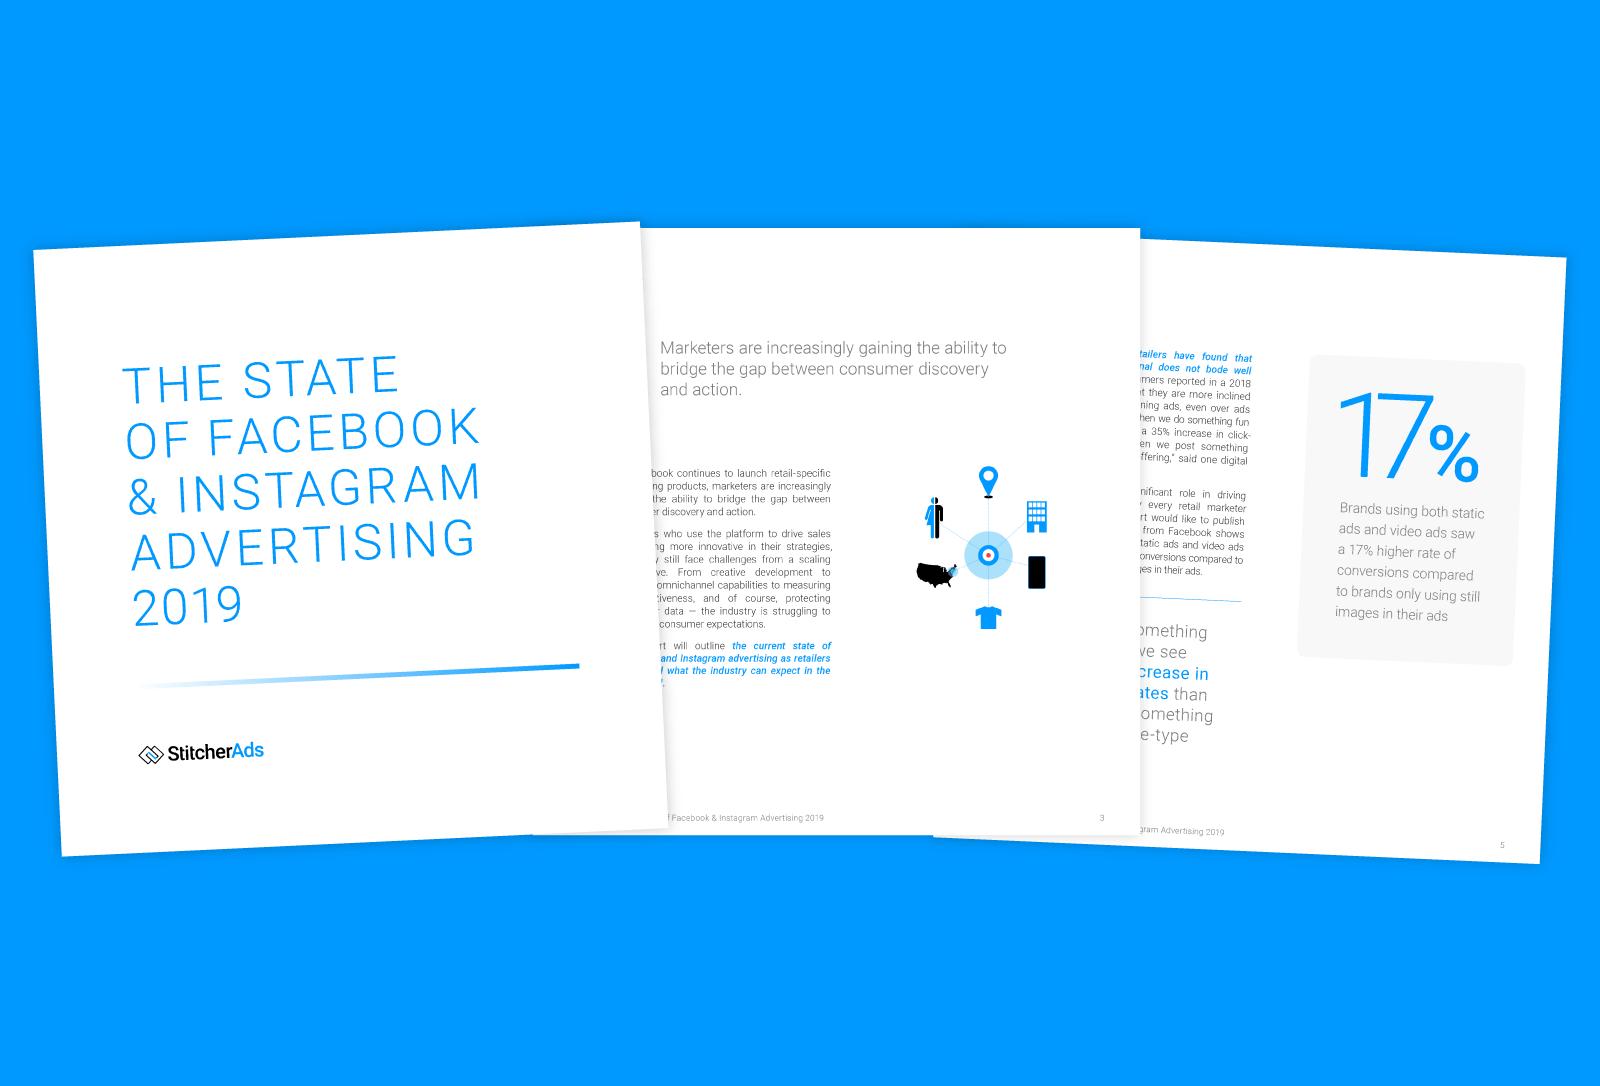 2019 state of facebook & instagram advertising